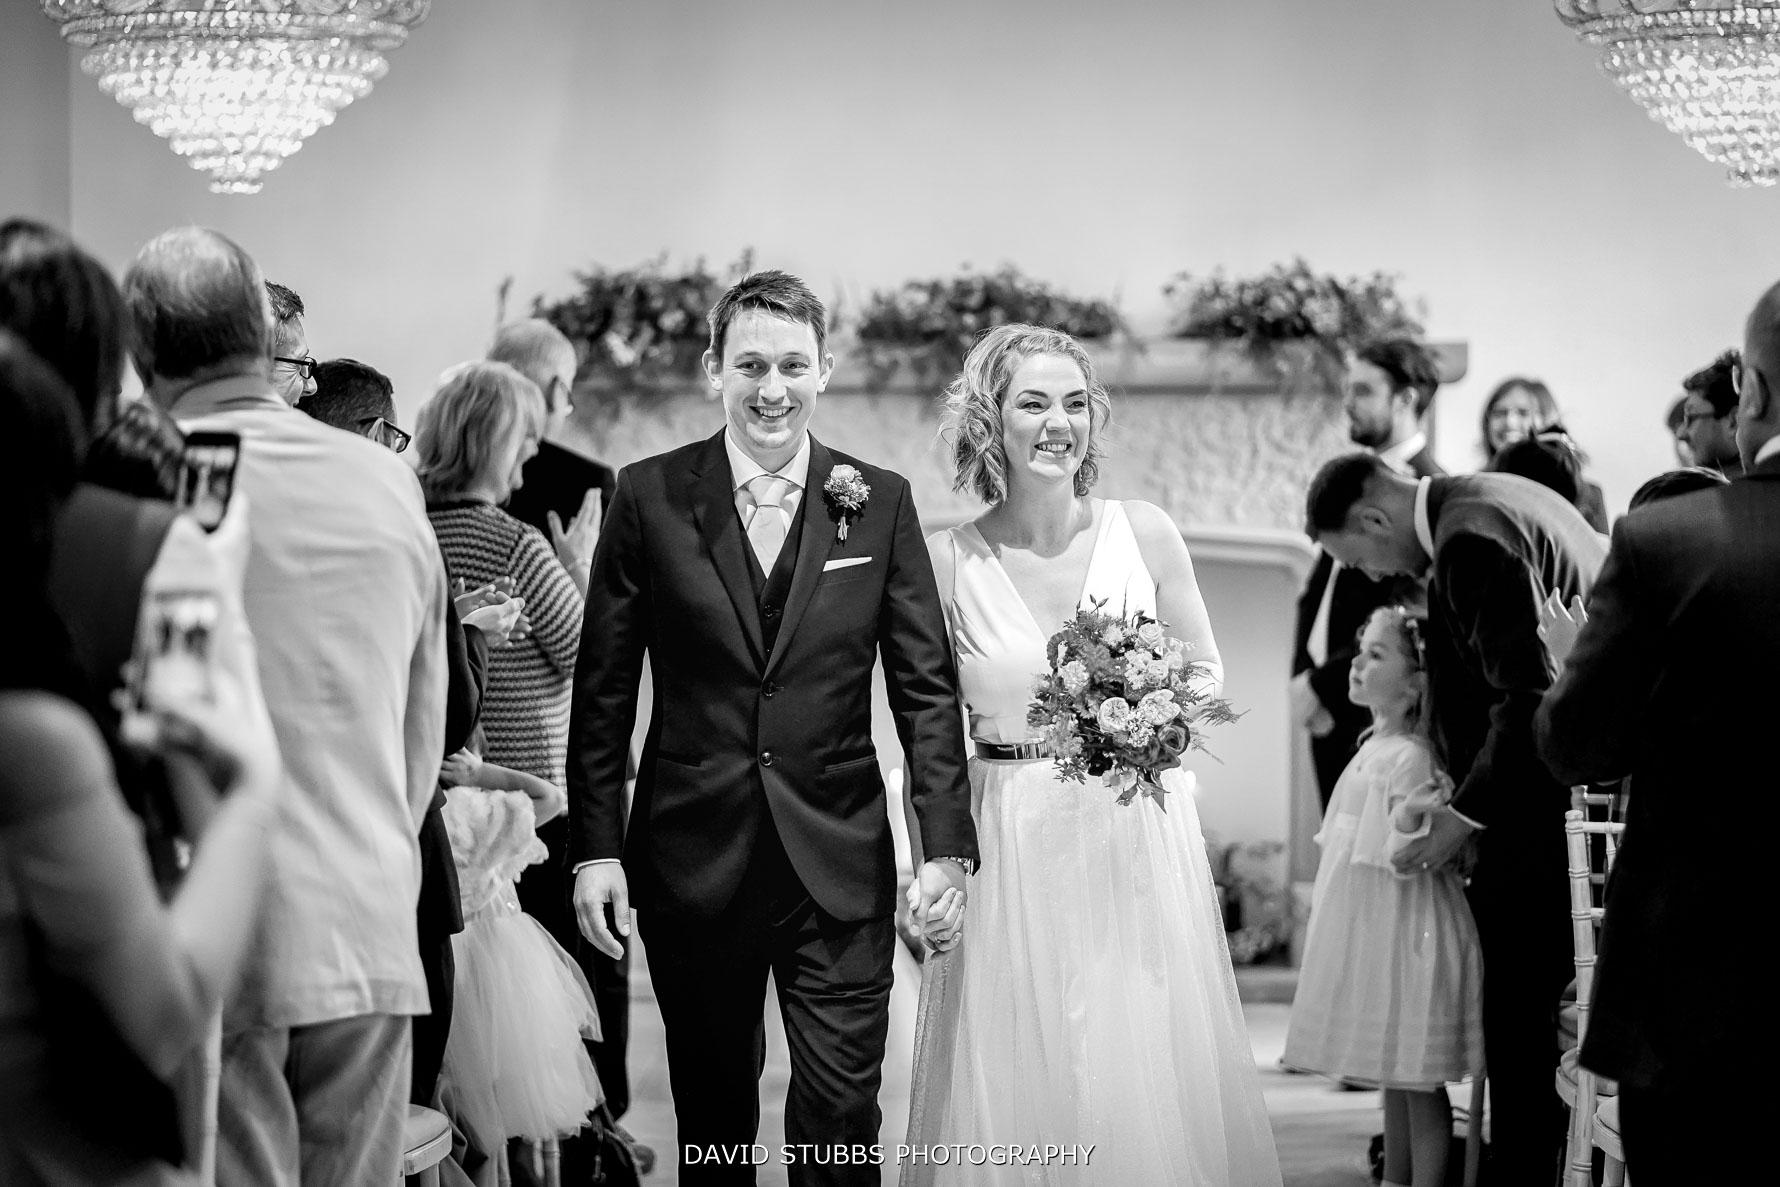 just married, they walk down the isle for their Tyn Dwr hall wedding